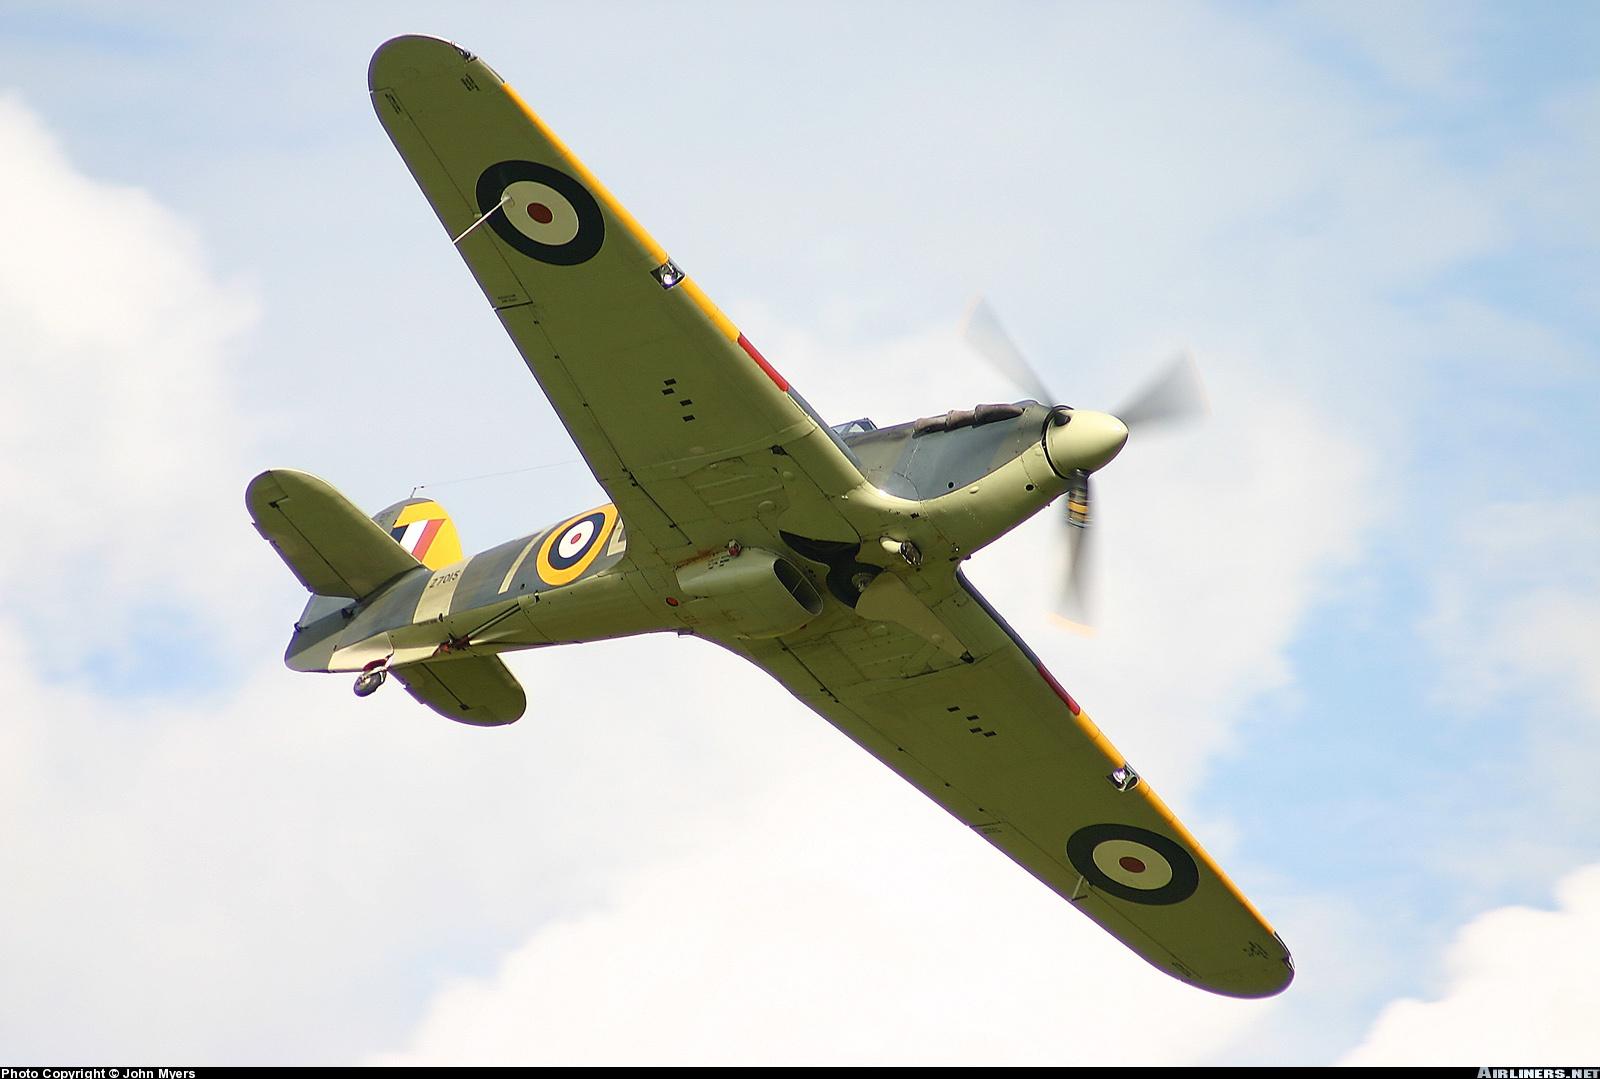 Airworthy Warbird Hawker Hurricane IIc RN 800NAS 7L Z7015 registered G BKTH 08